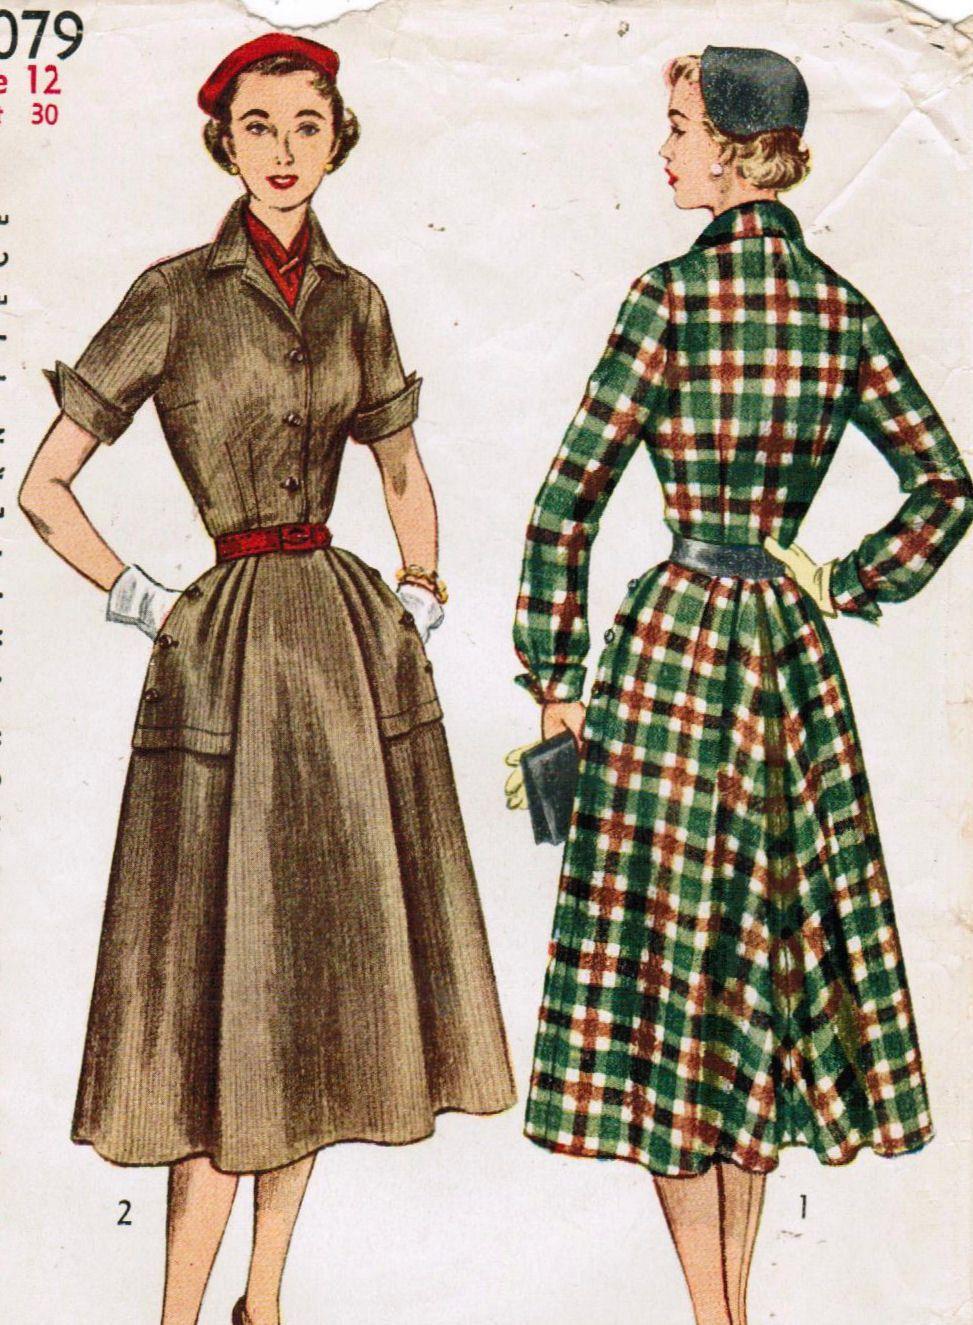 1950s simplicity 4079 vintage sewing pattern misses dress size 12 1950s simplicity 4079 vintage sewing pattern misses dress size 12 bust 30 jeuxipadfo Choice Image